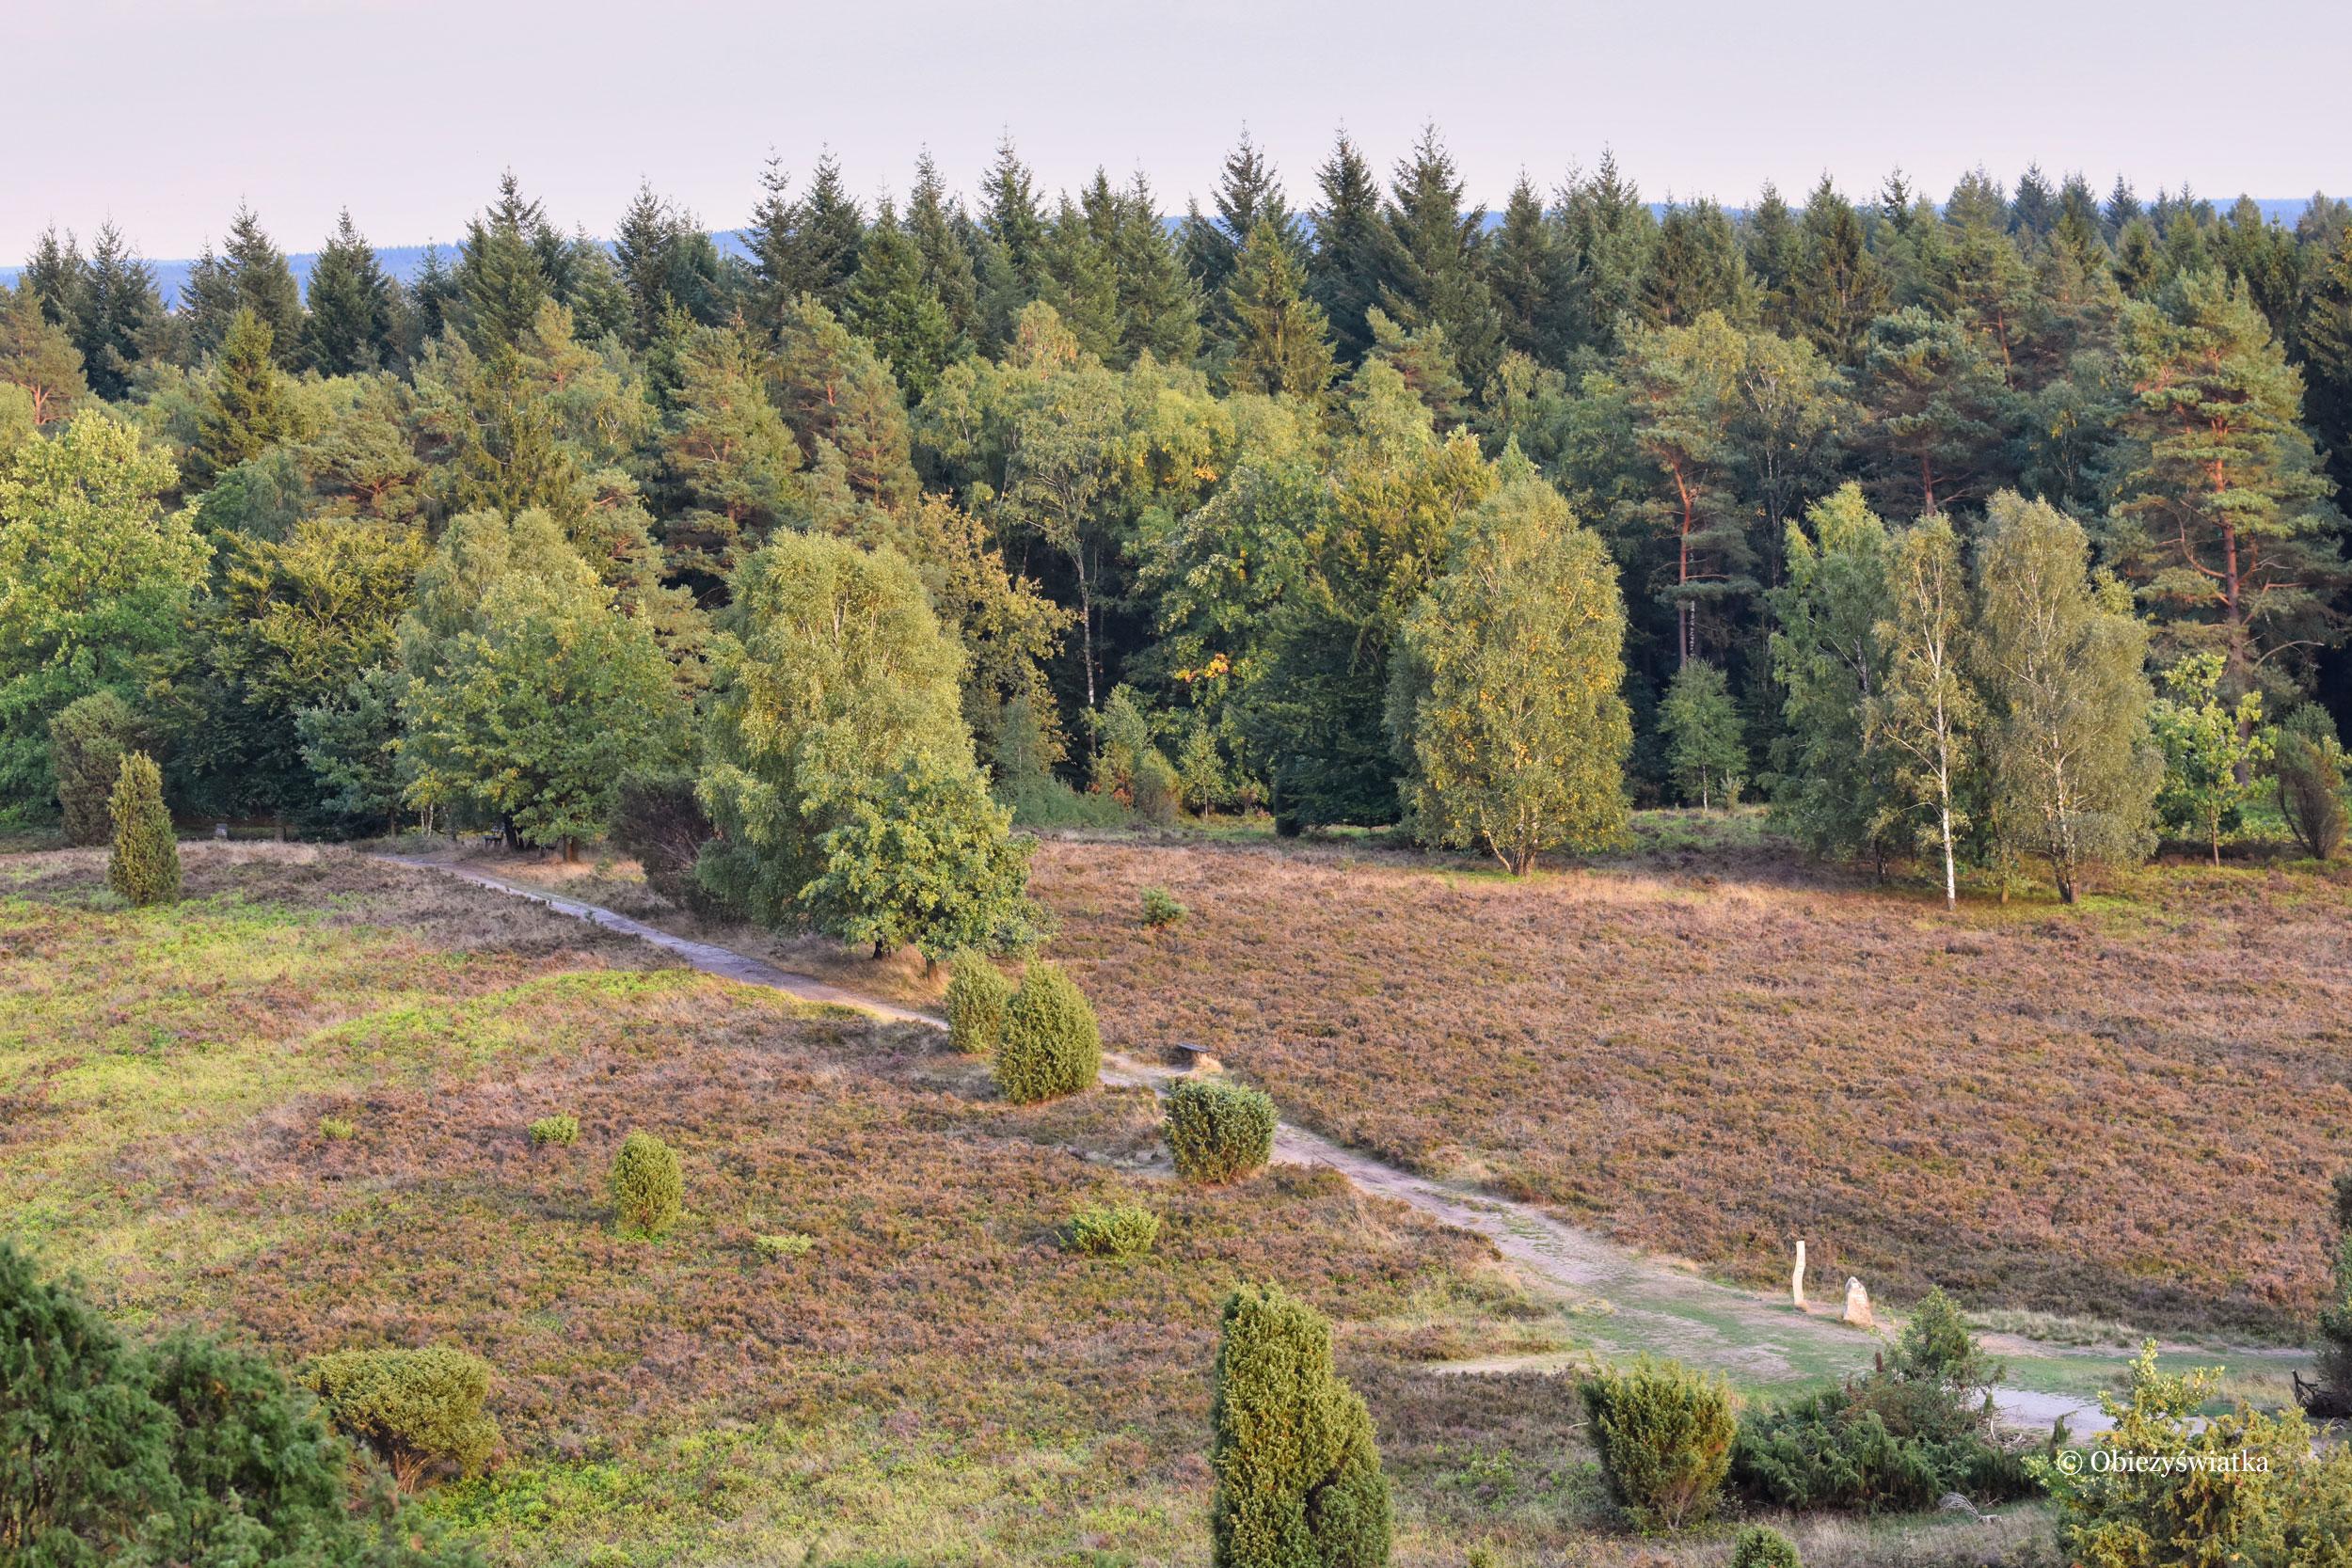 Toter Grund, Lüneburger Heide, Dolna Saksonia